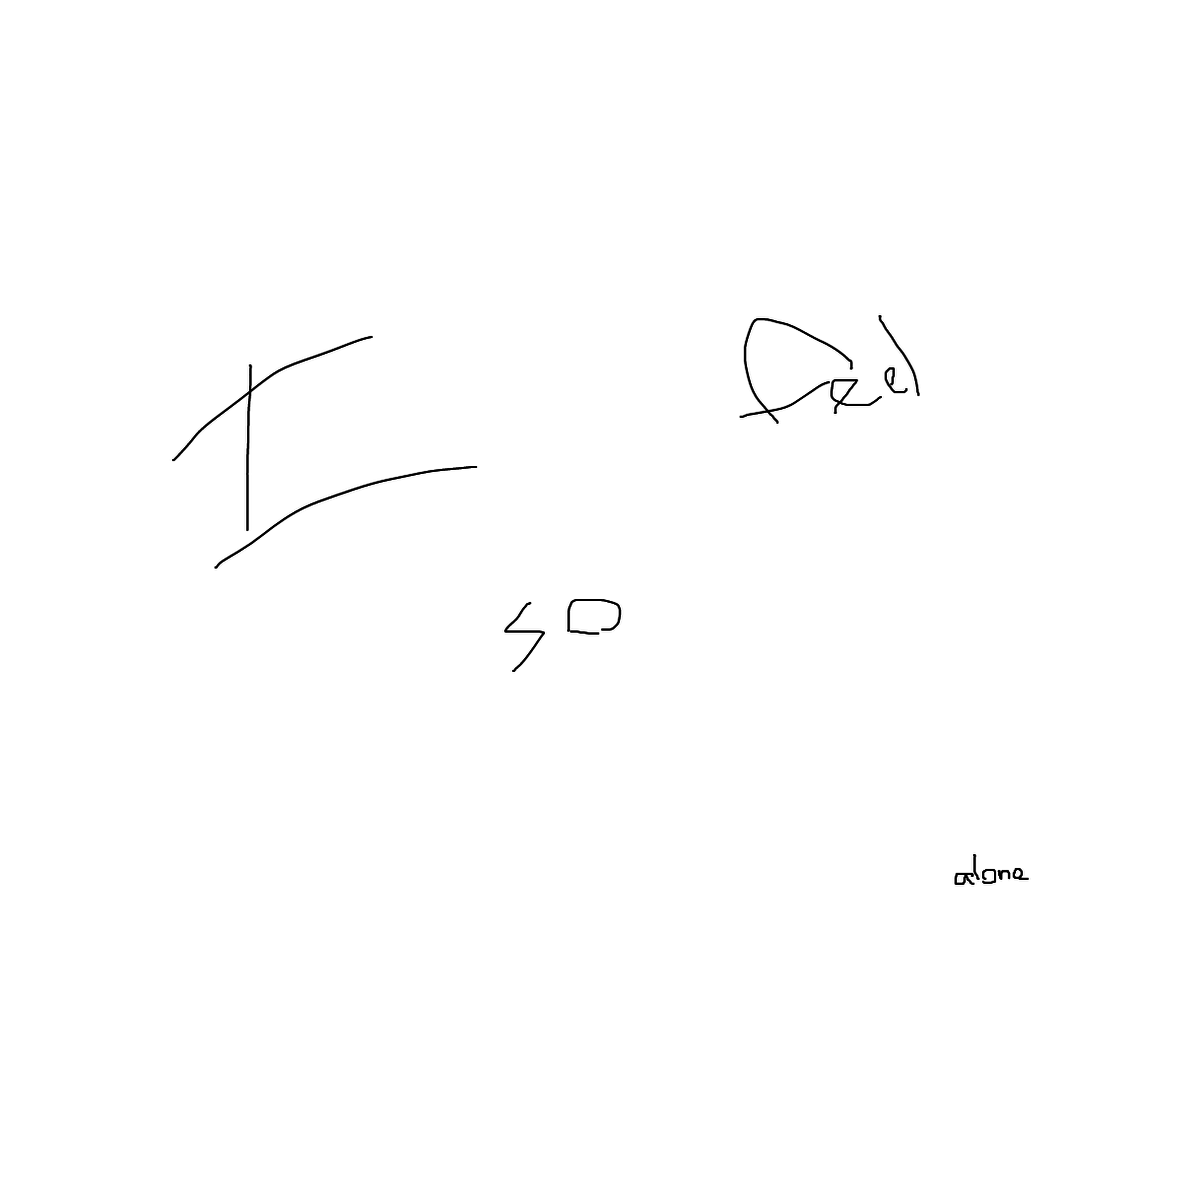 BAAAM drawing#10961 lat:53.0198249816894500lng: 12.0682210922241210